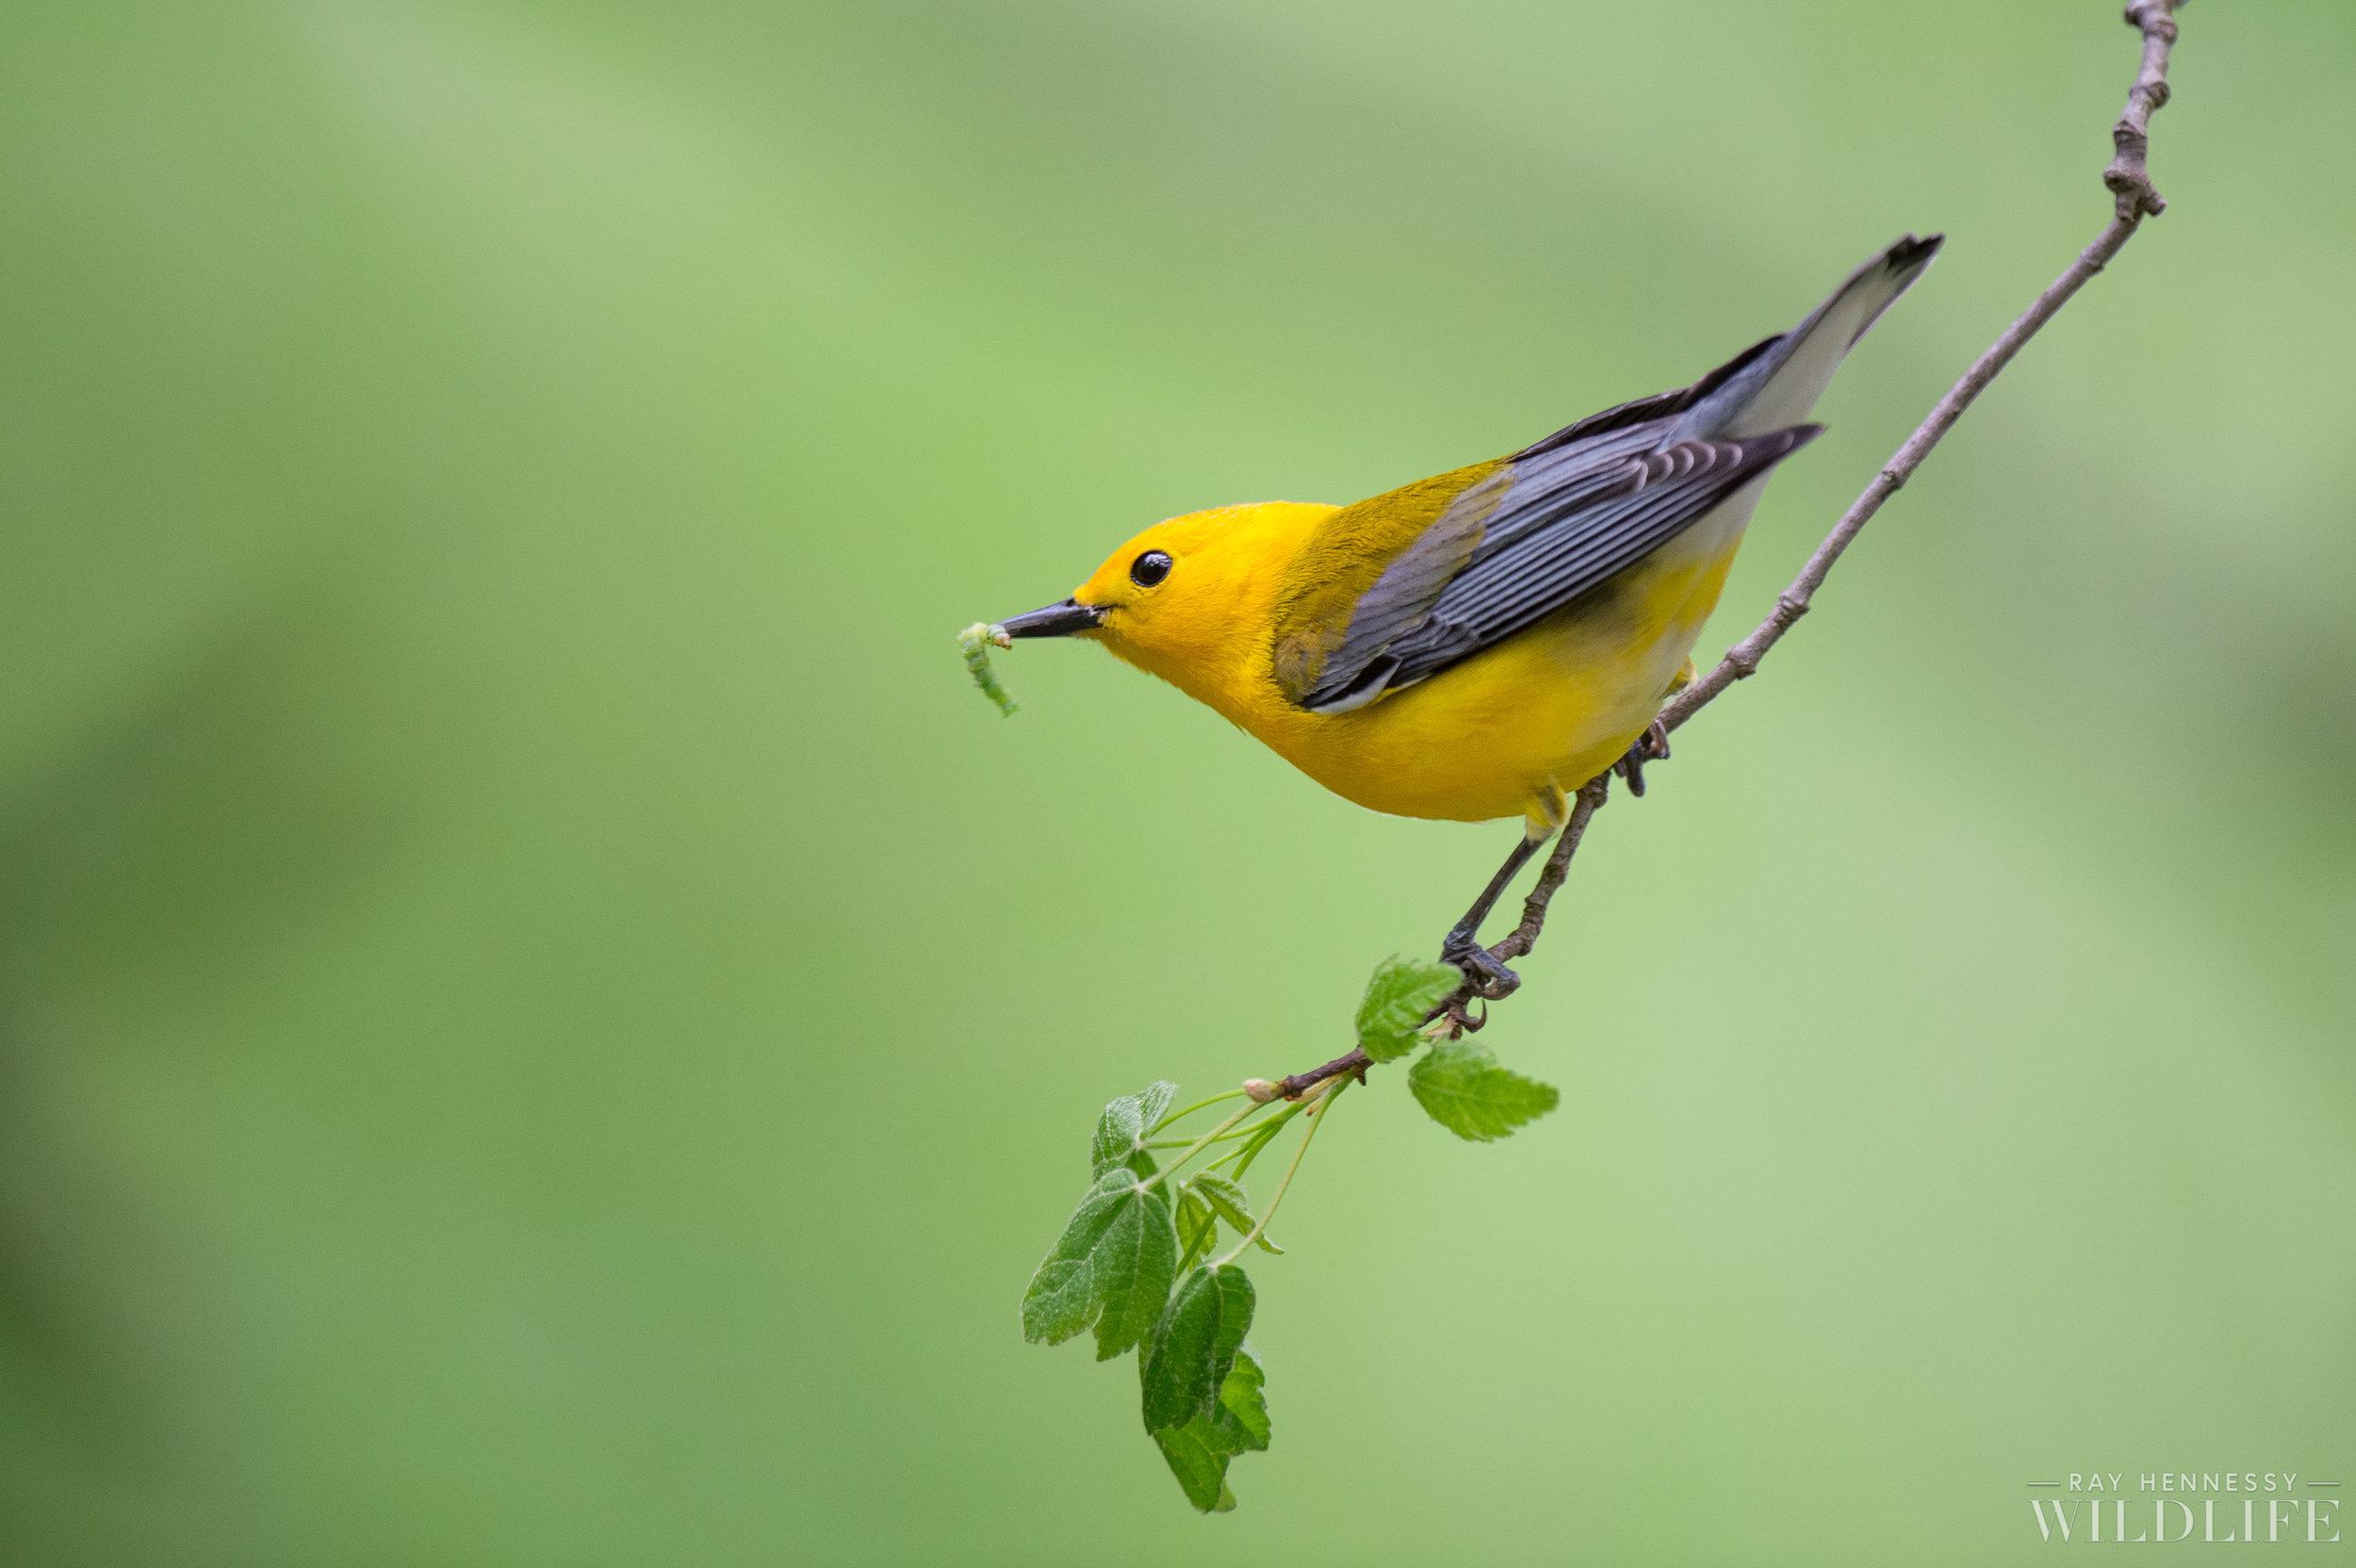 010_Prothonotary Warbler.jpg